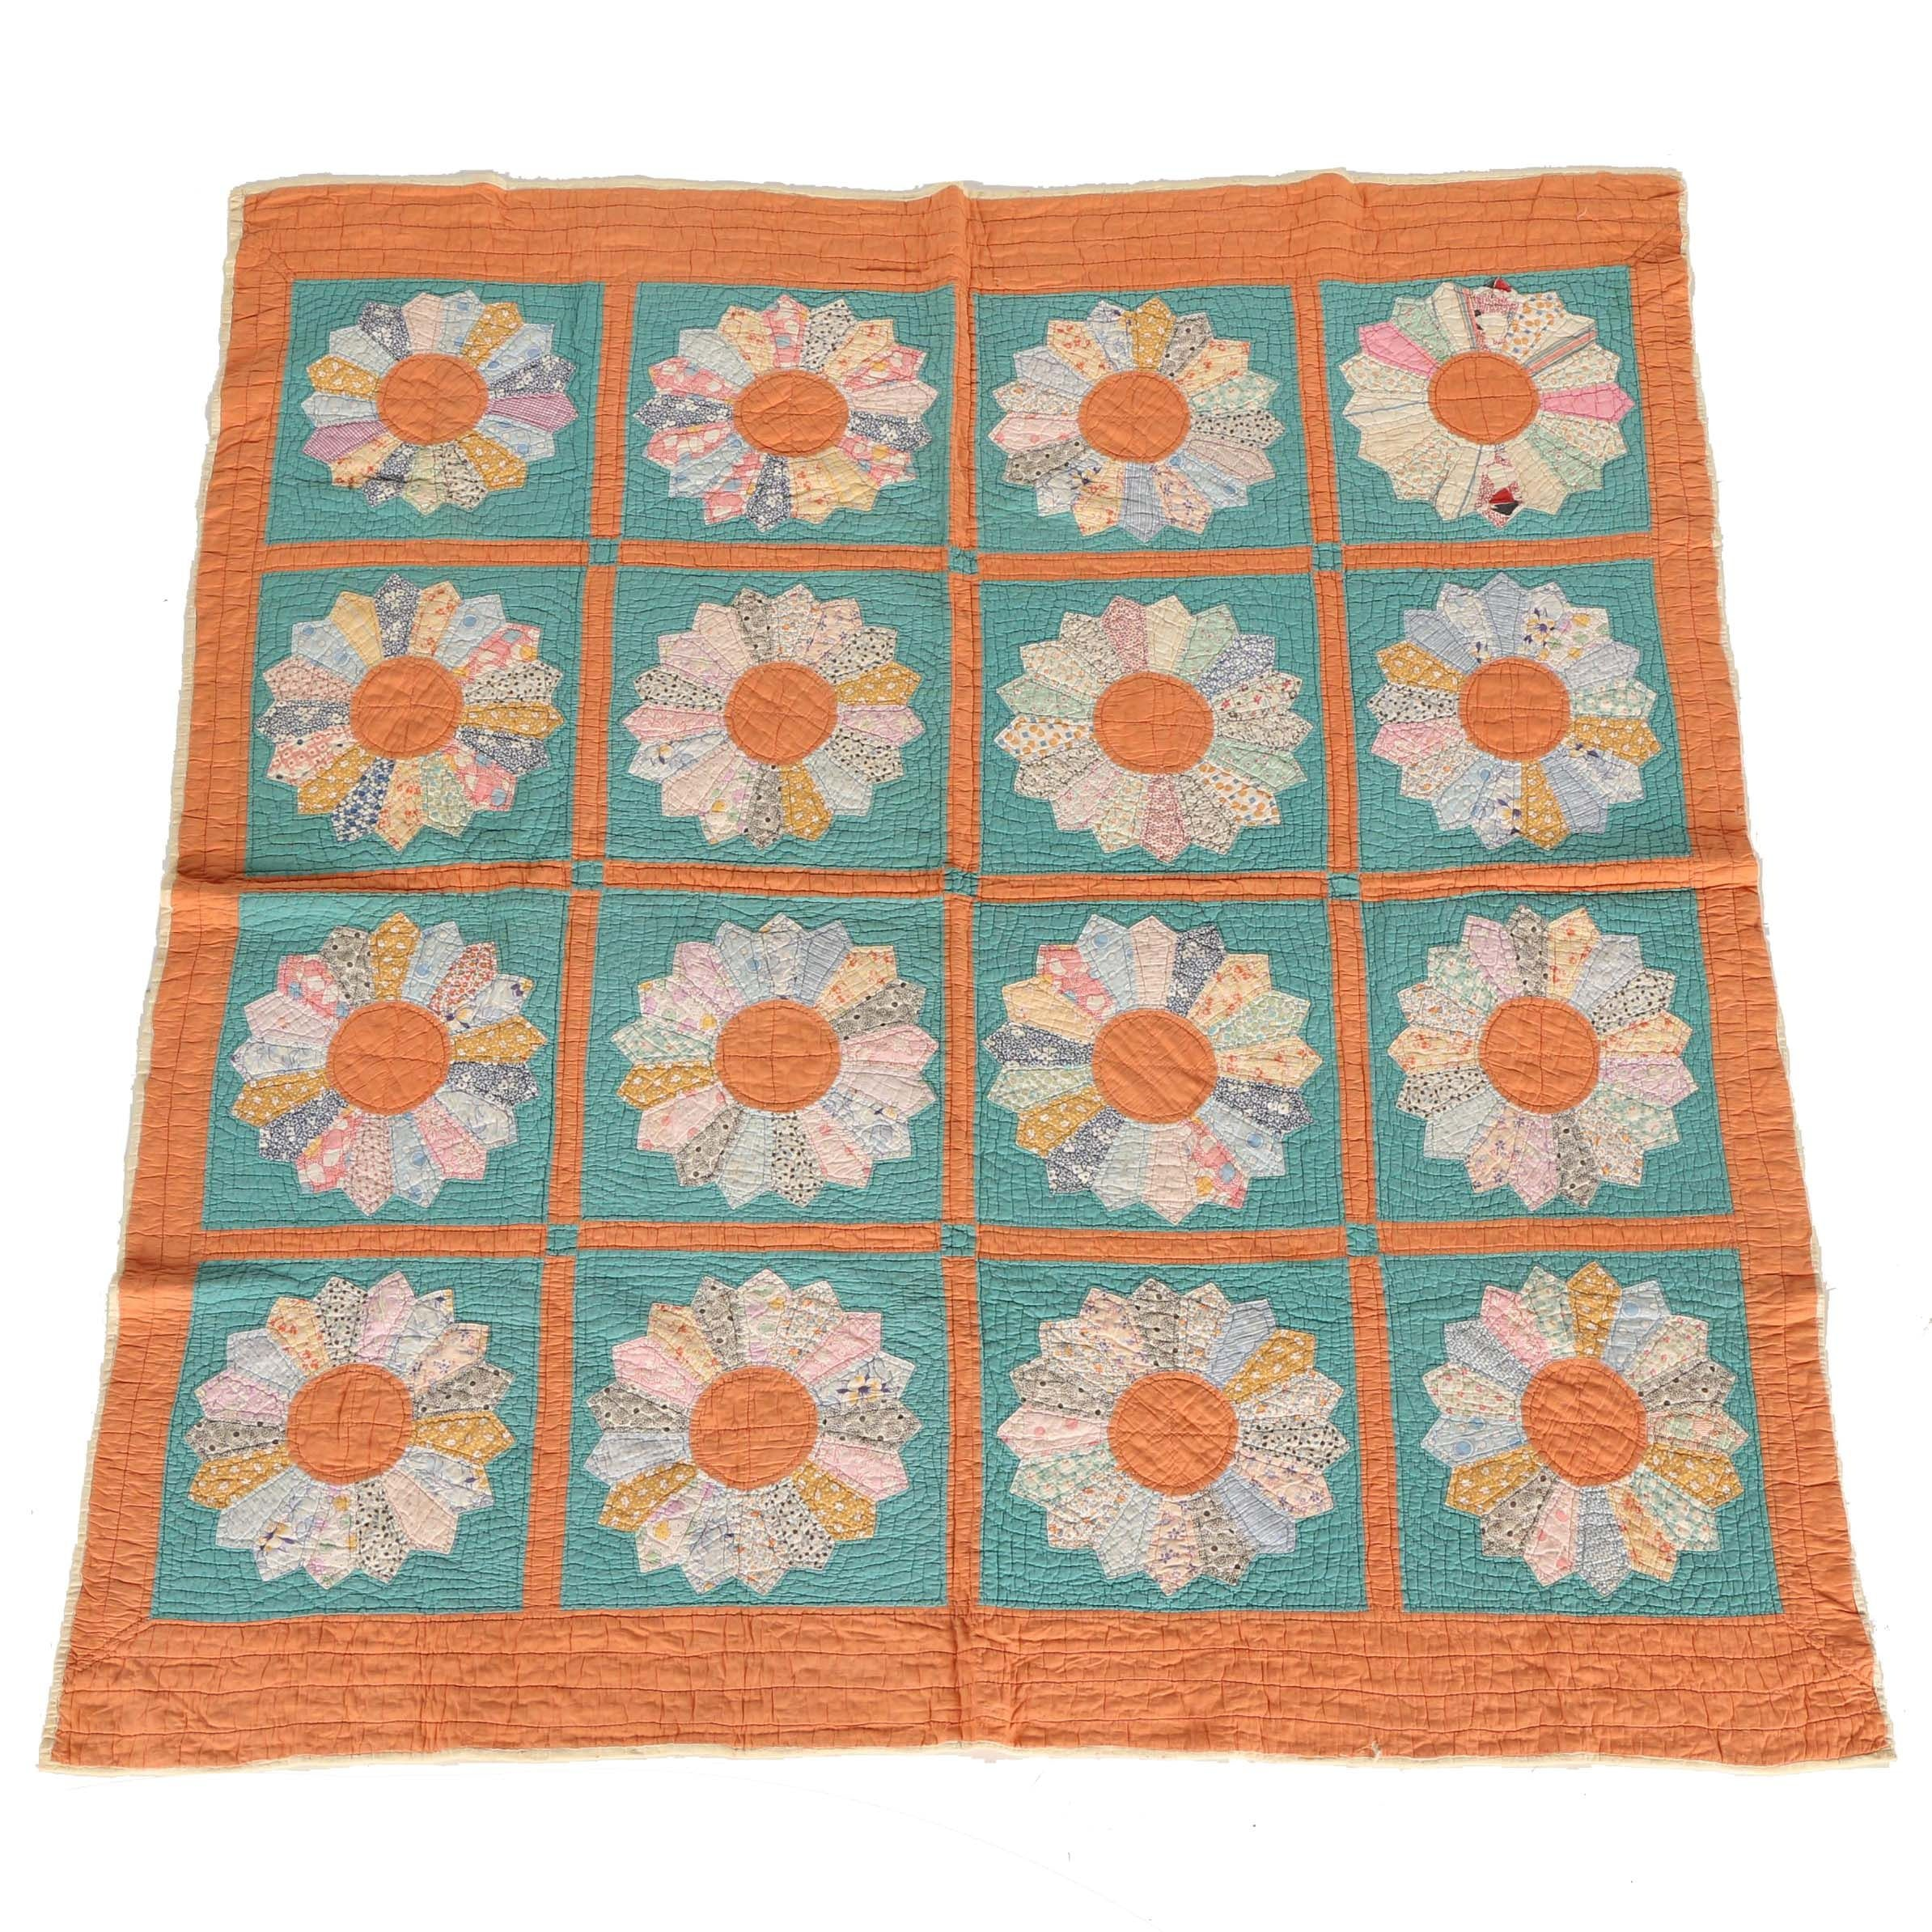 Handmade Floral Patterned Quilt